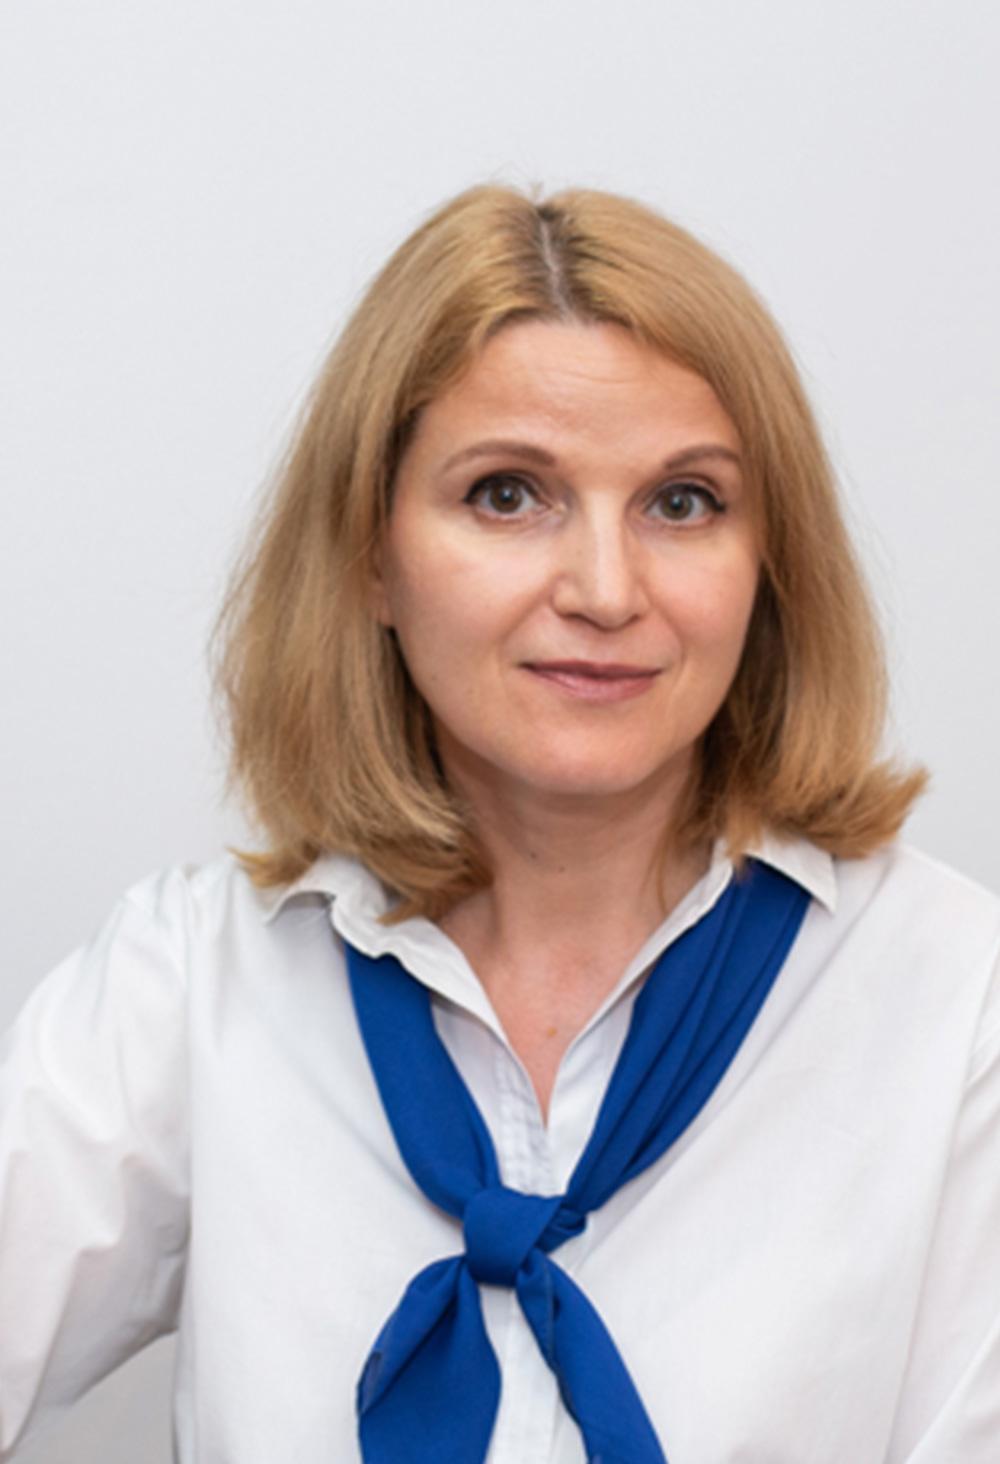 Inna Shakhanova